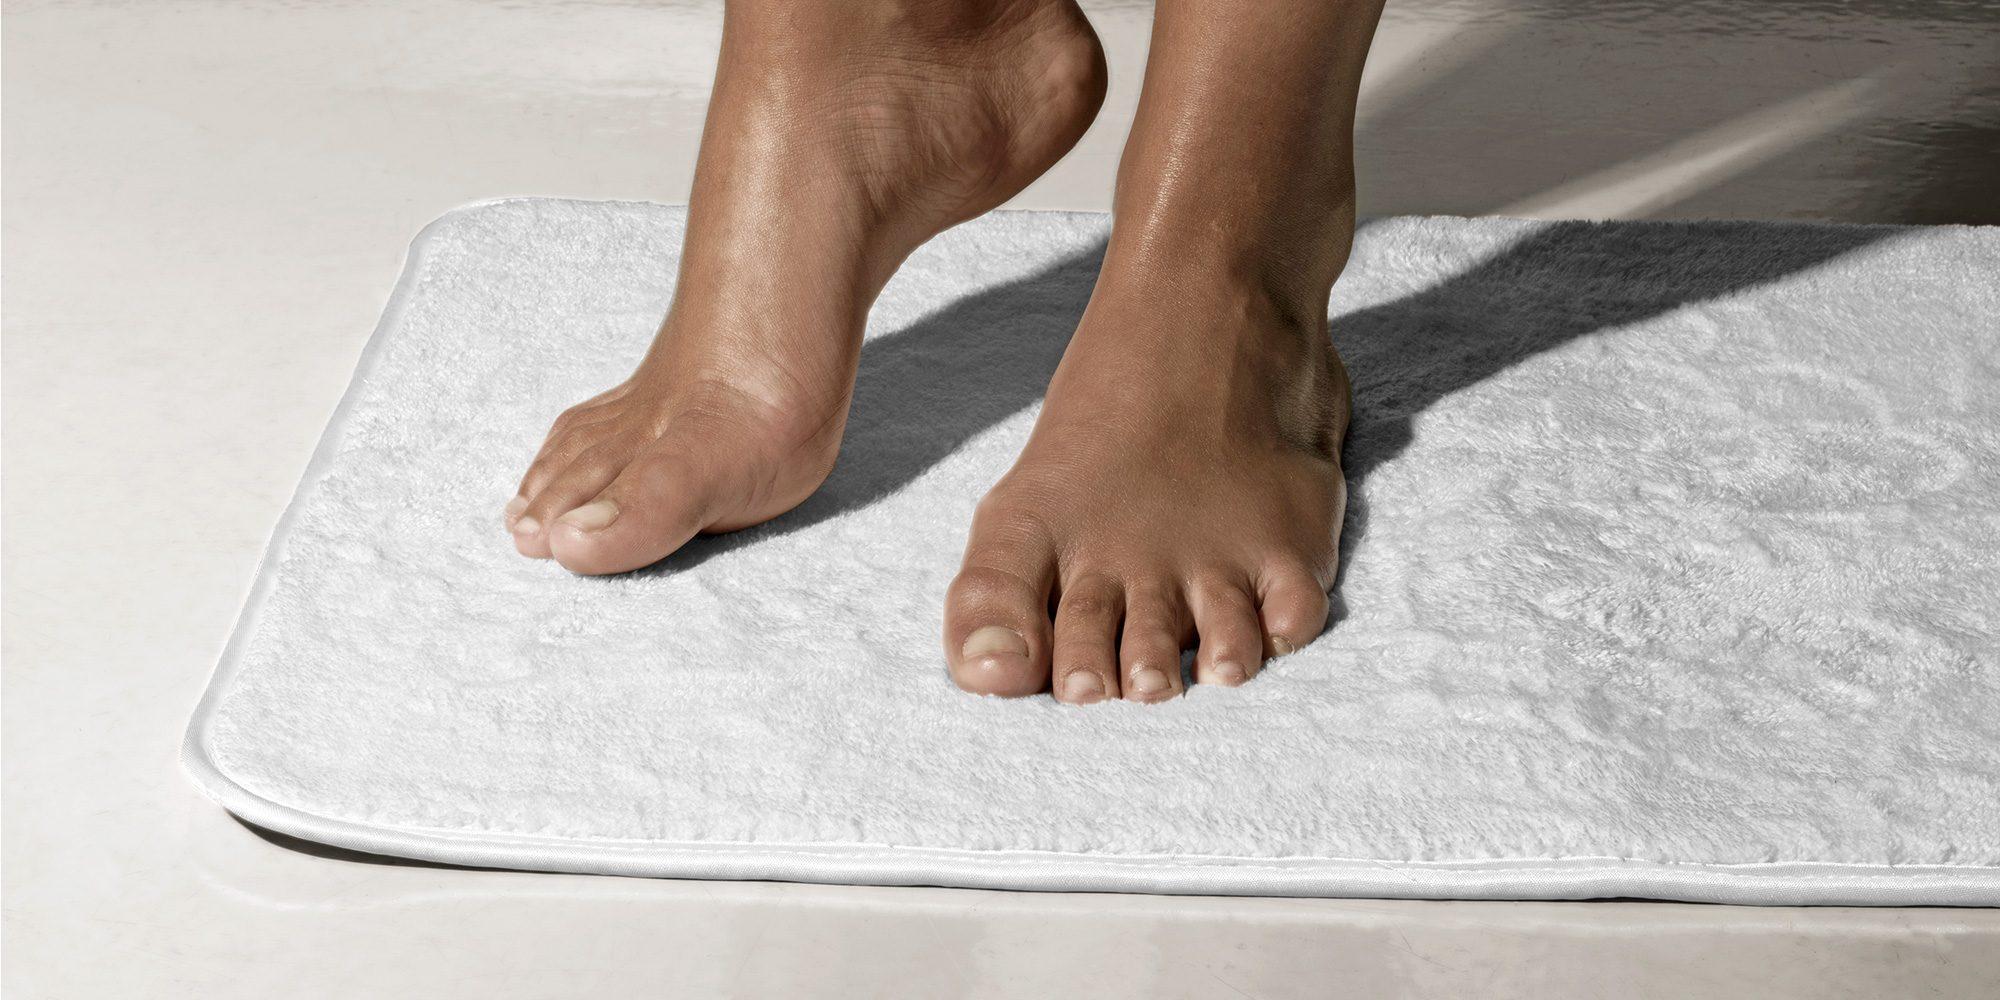 Bathmat 65x45 – Smart Microfiber